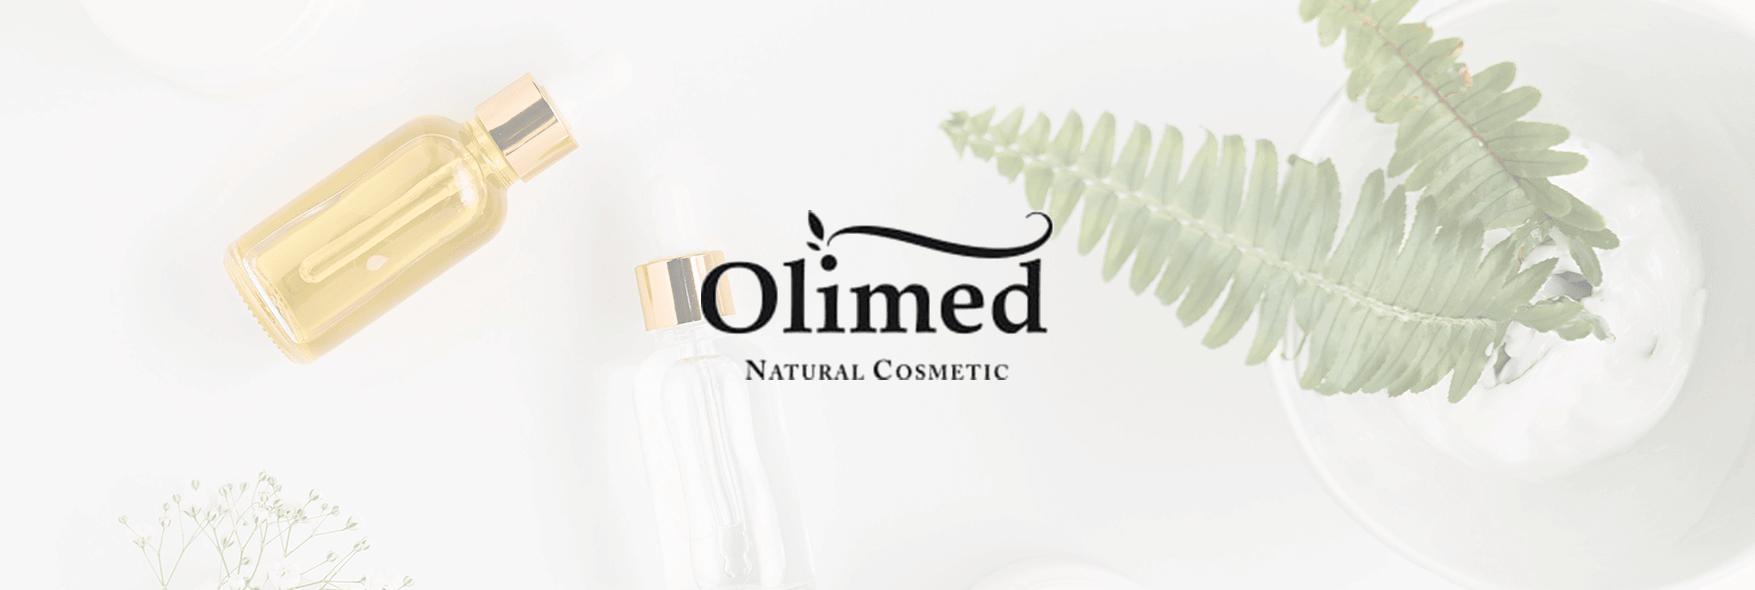 Olimed Cosmetics - fondo